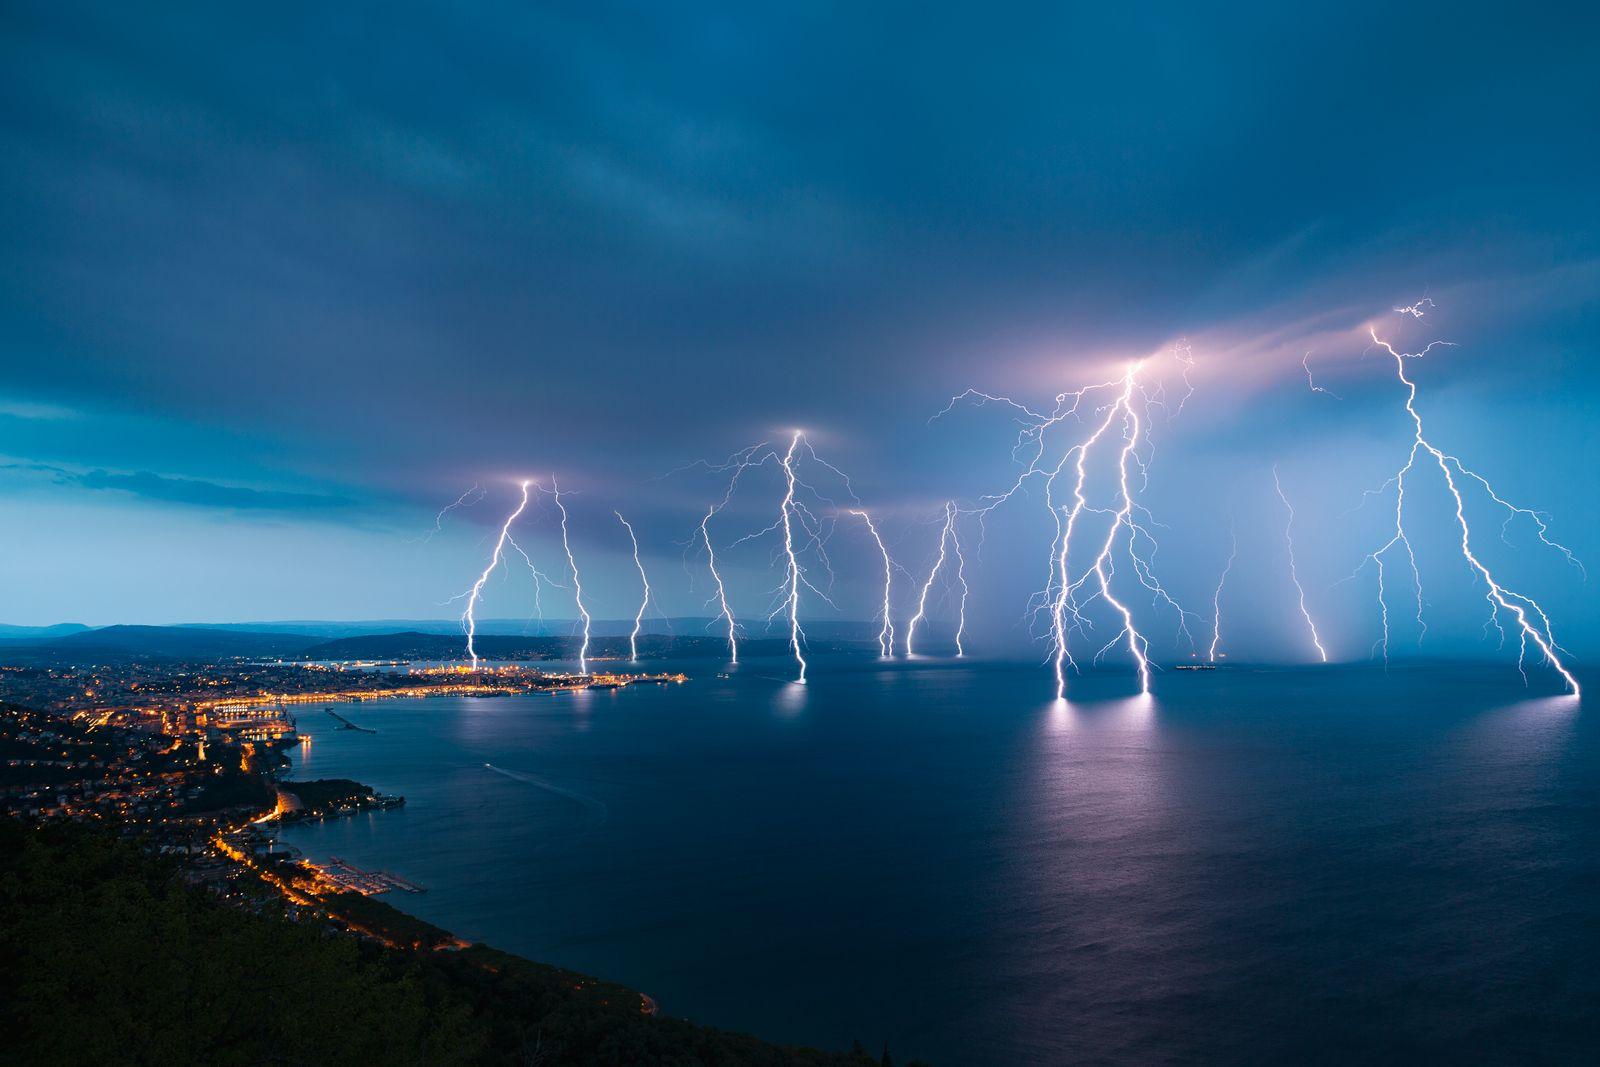 Trieste Lightning